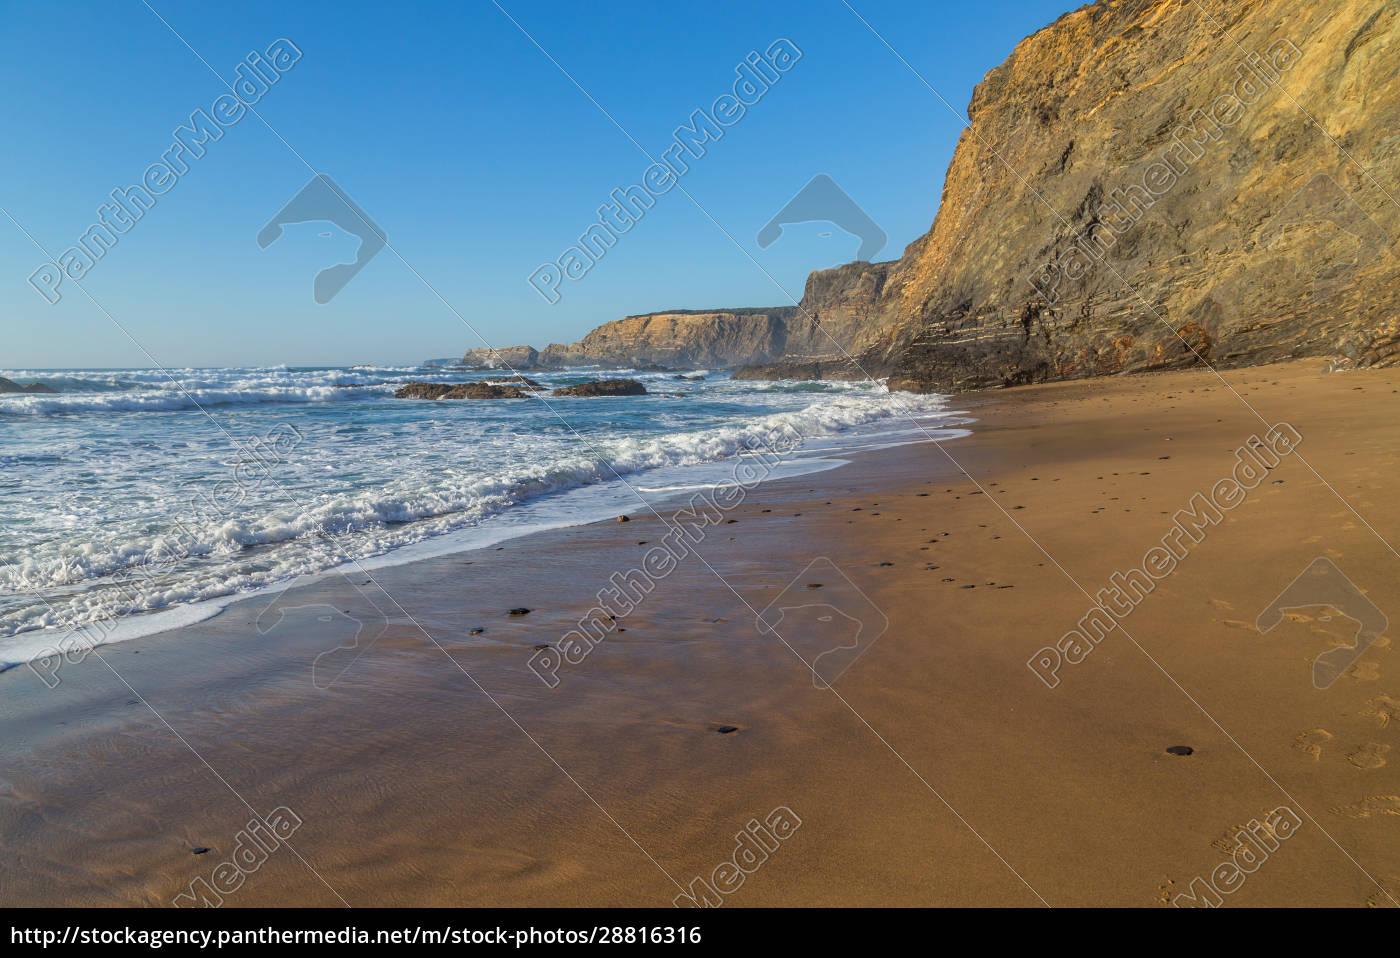 atlantic, isolated, beach - 28816316